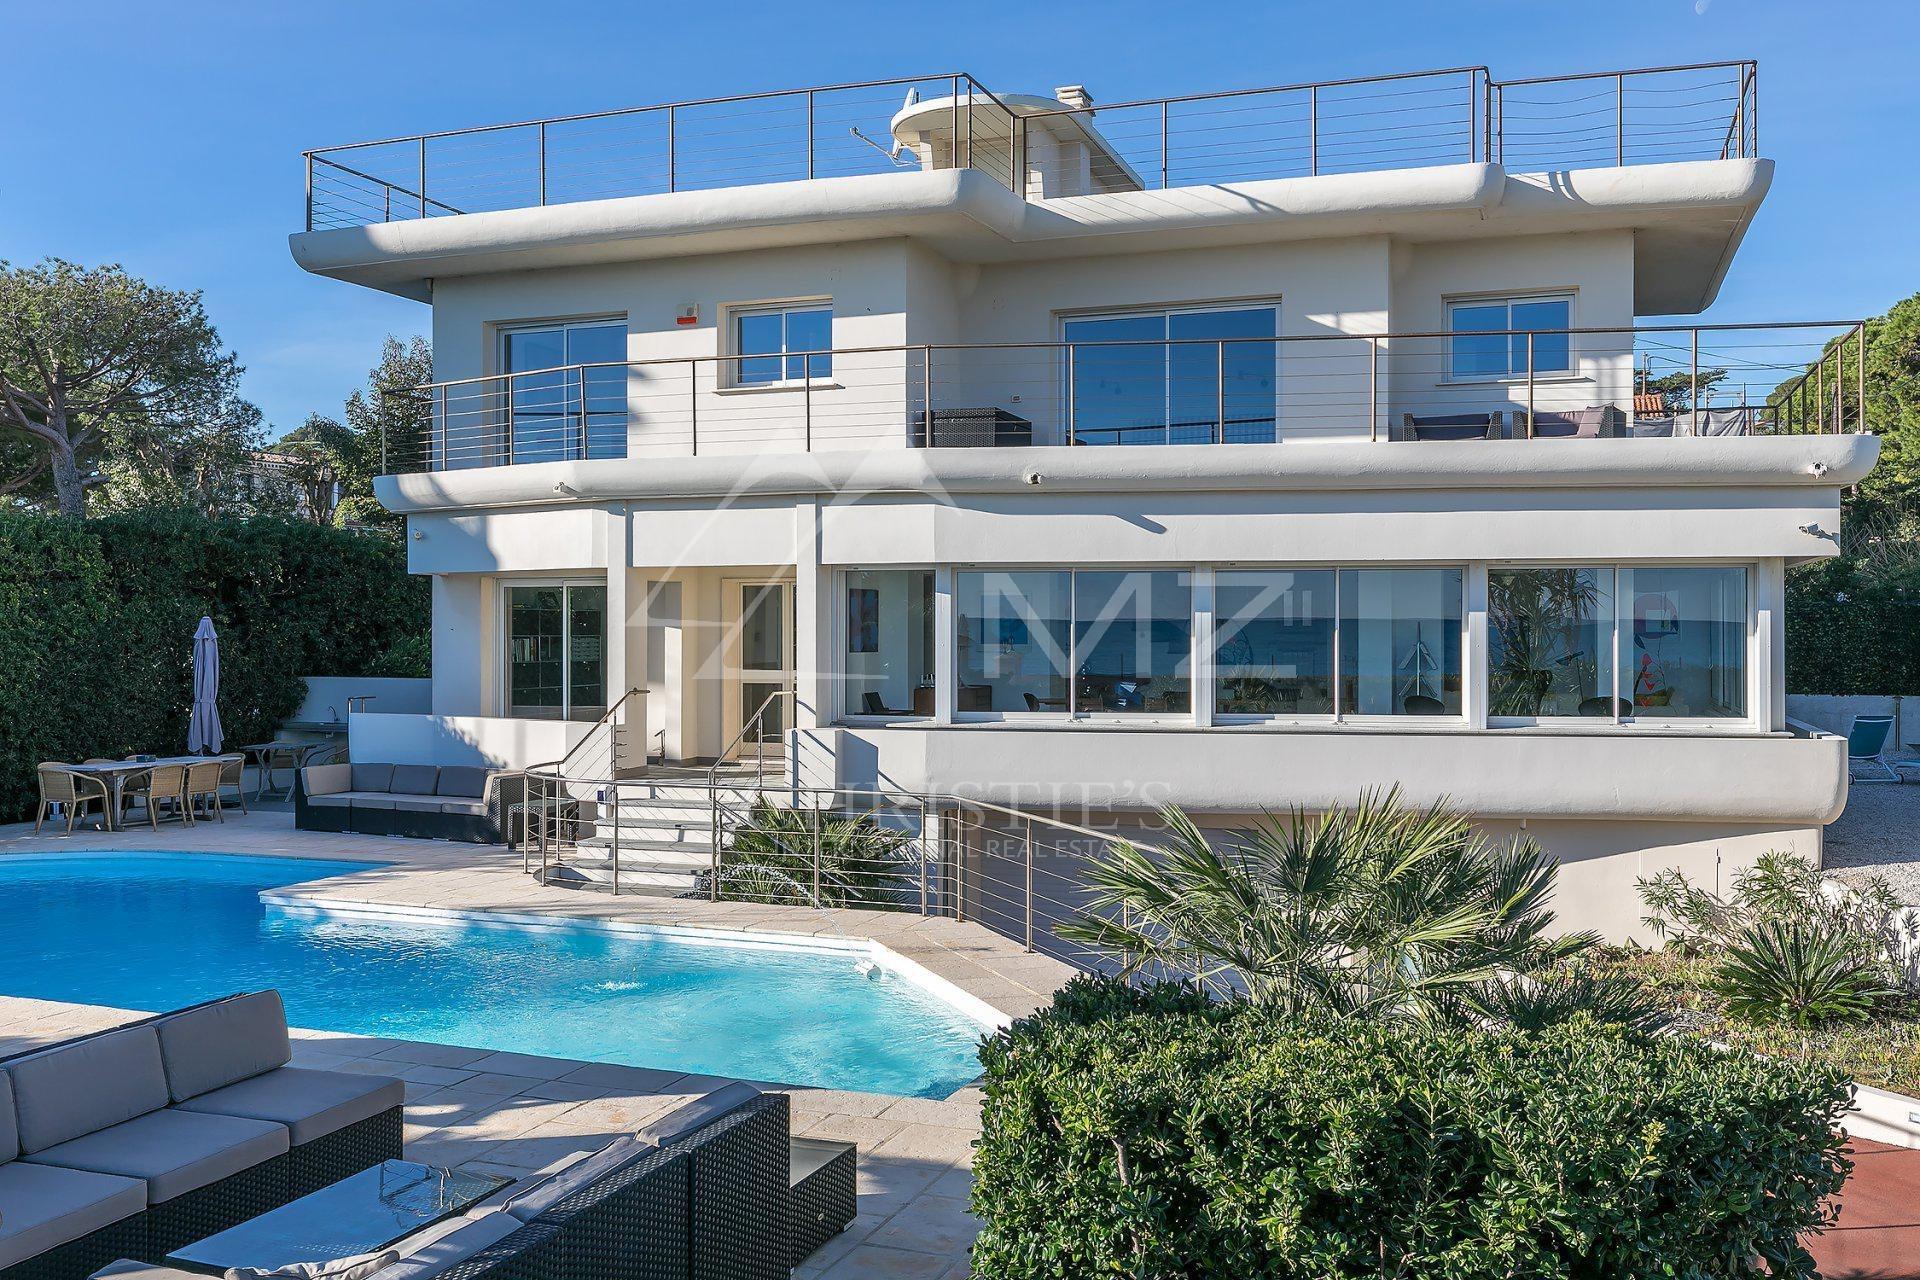 Villa in Antibes, Provence-Alpes-Côte d'Azur, France 1 - 10647992